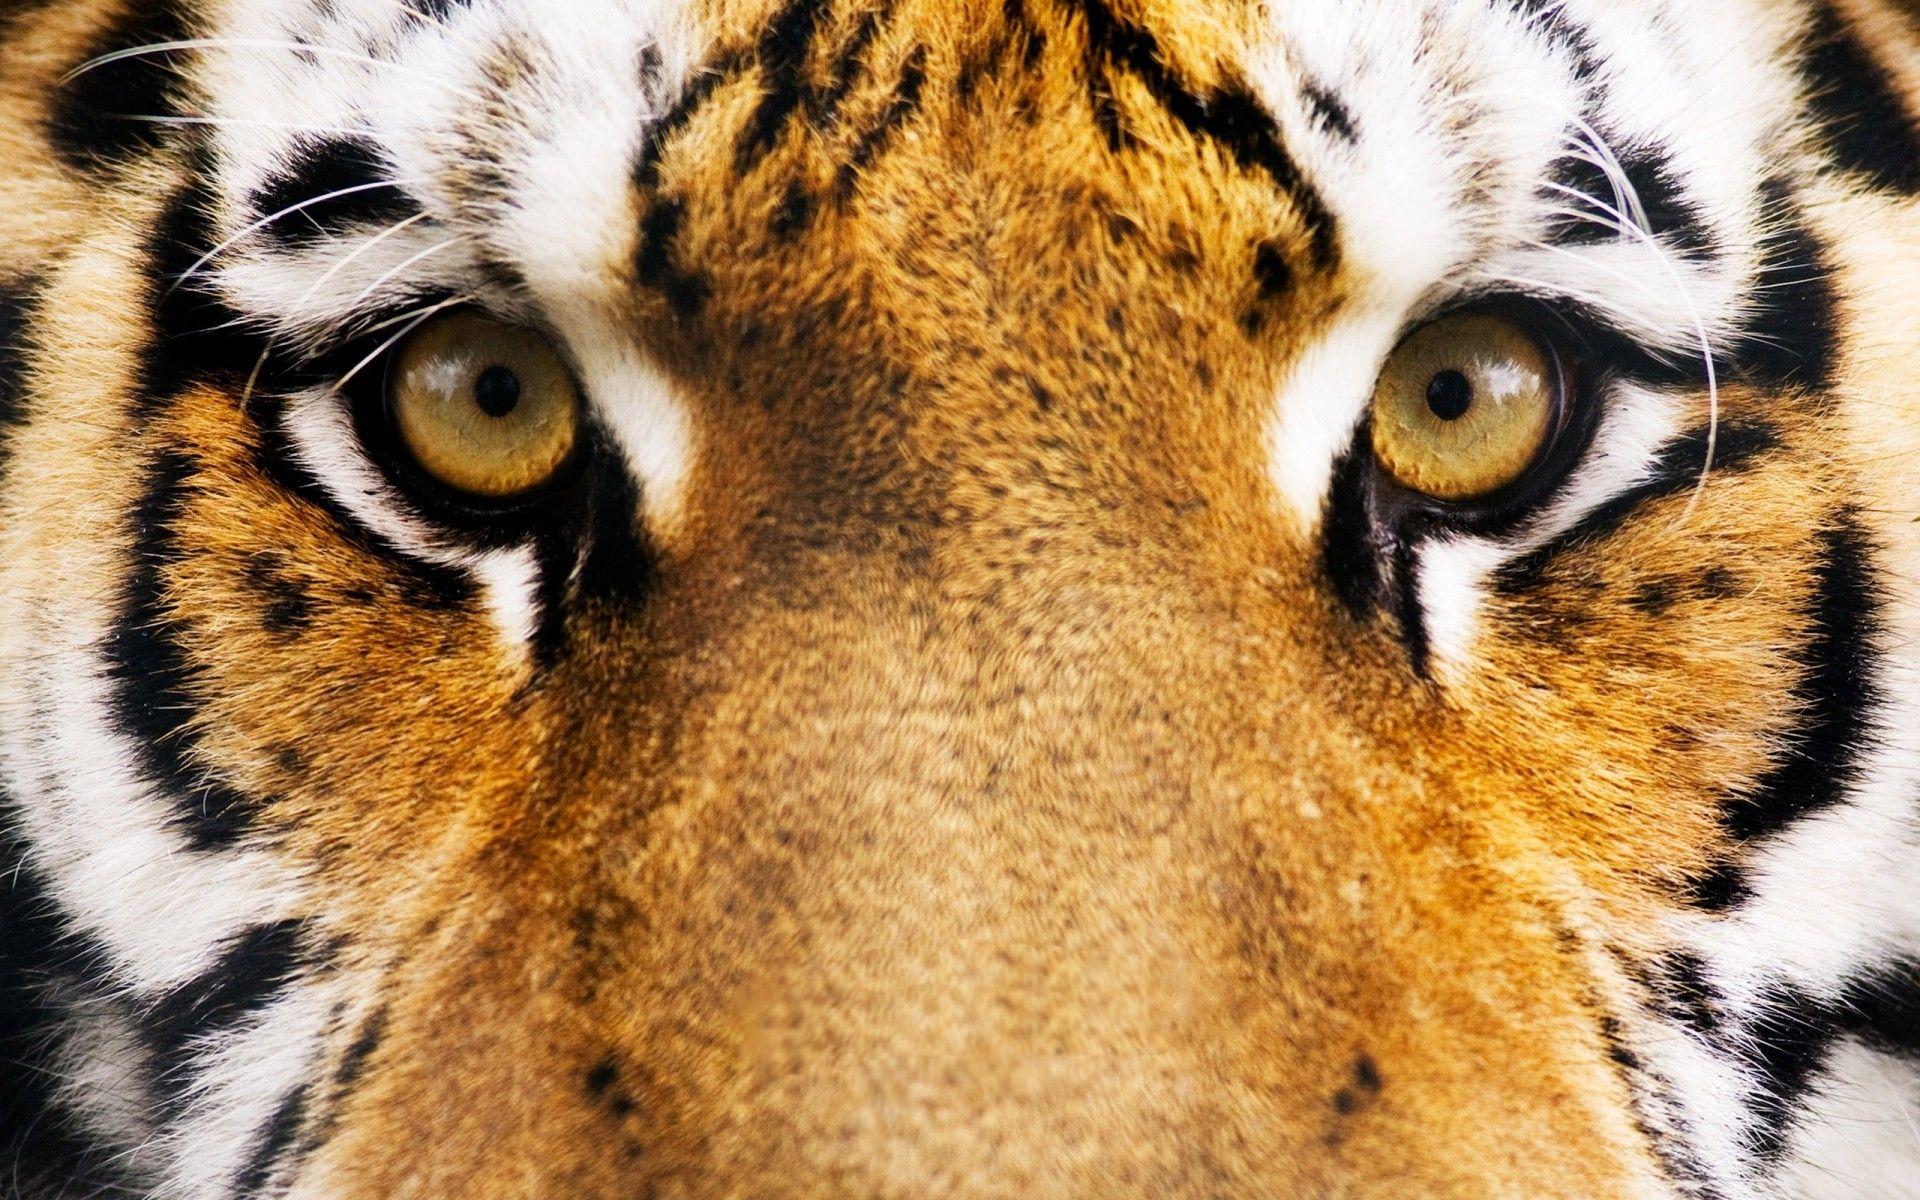 Tiger's face, HD Wallpaper